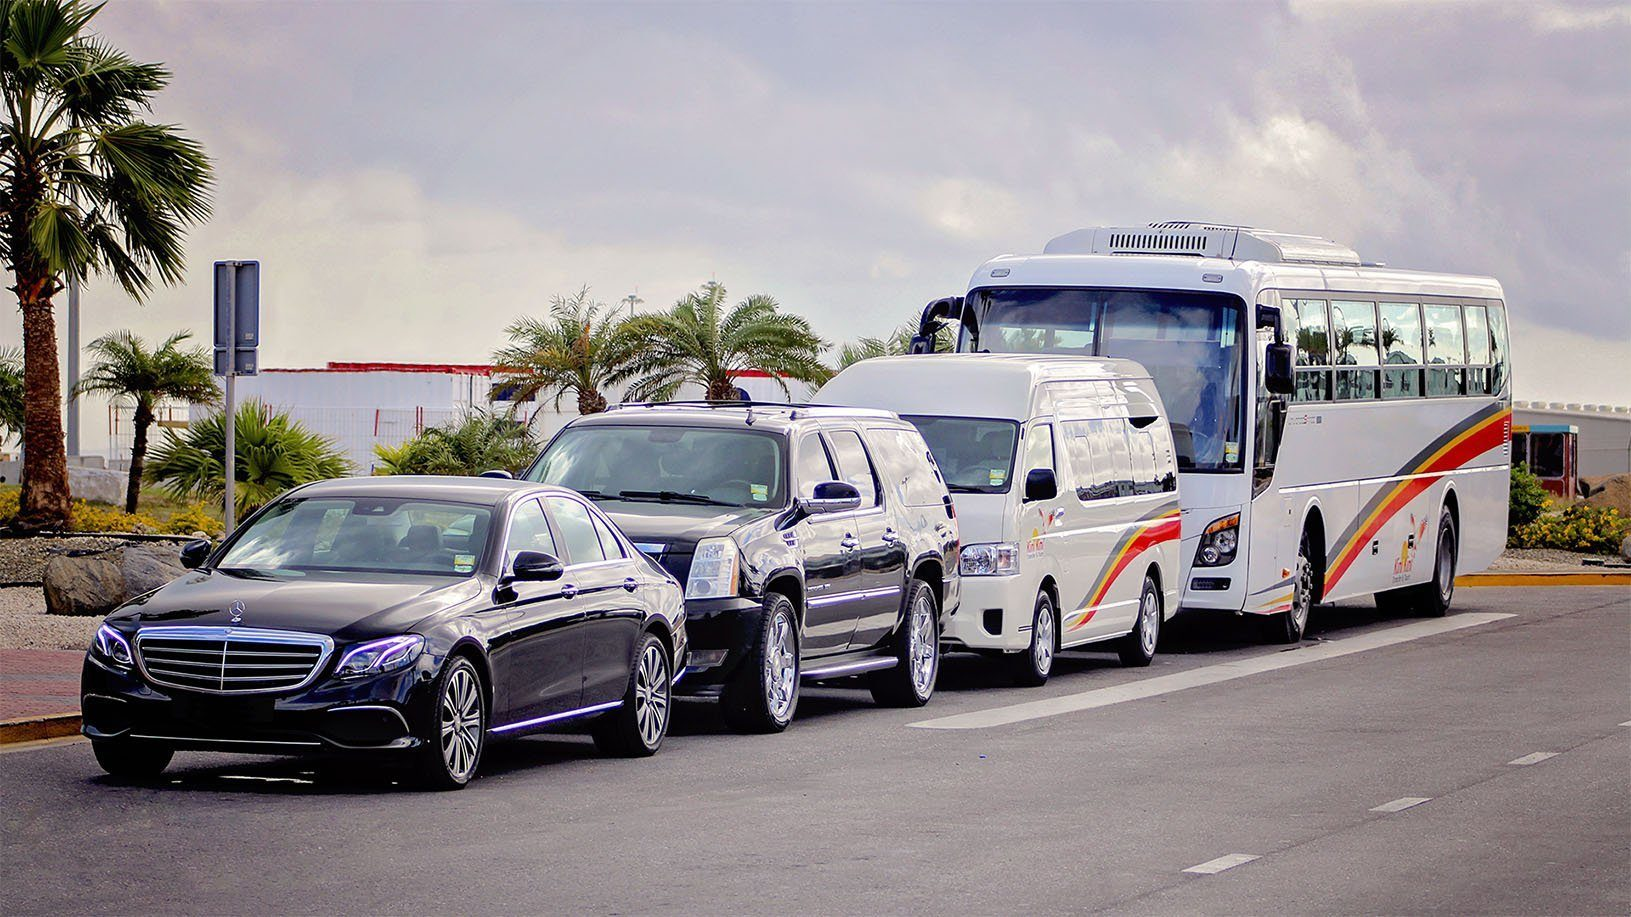 Aruba Airport Transfer Services